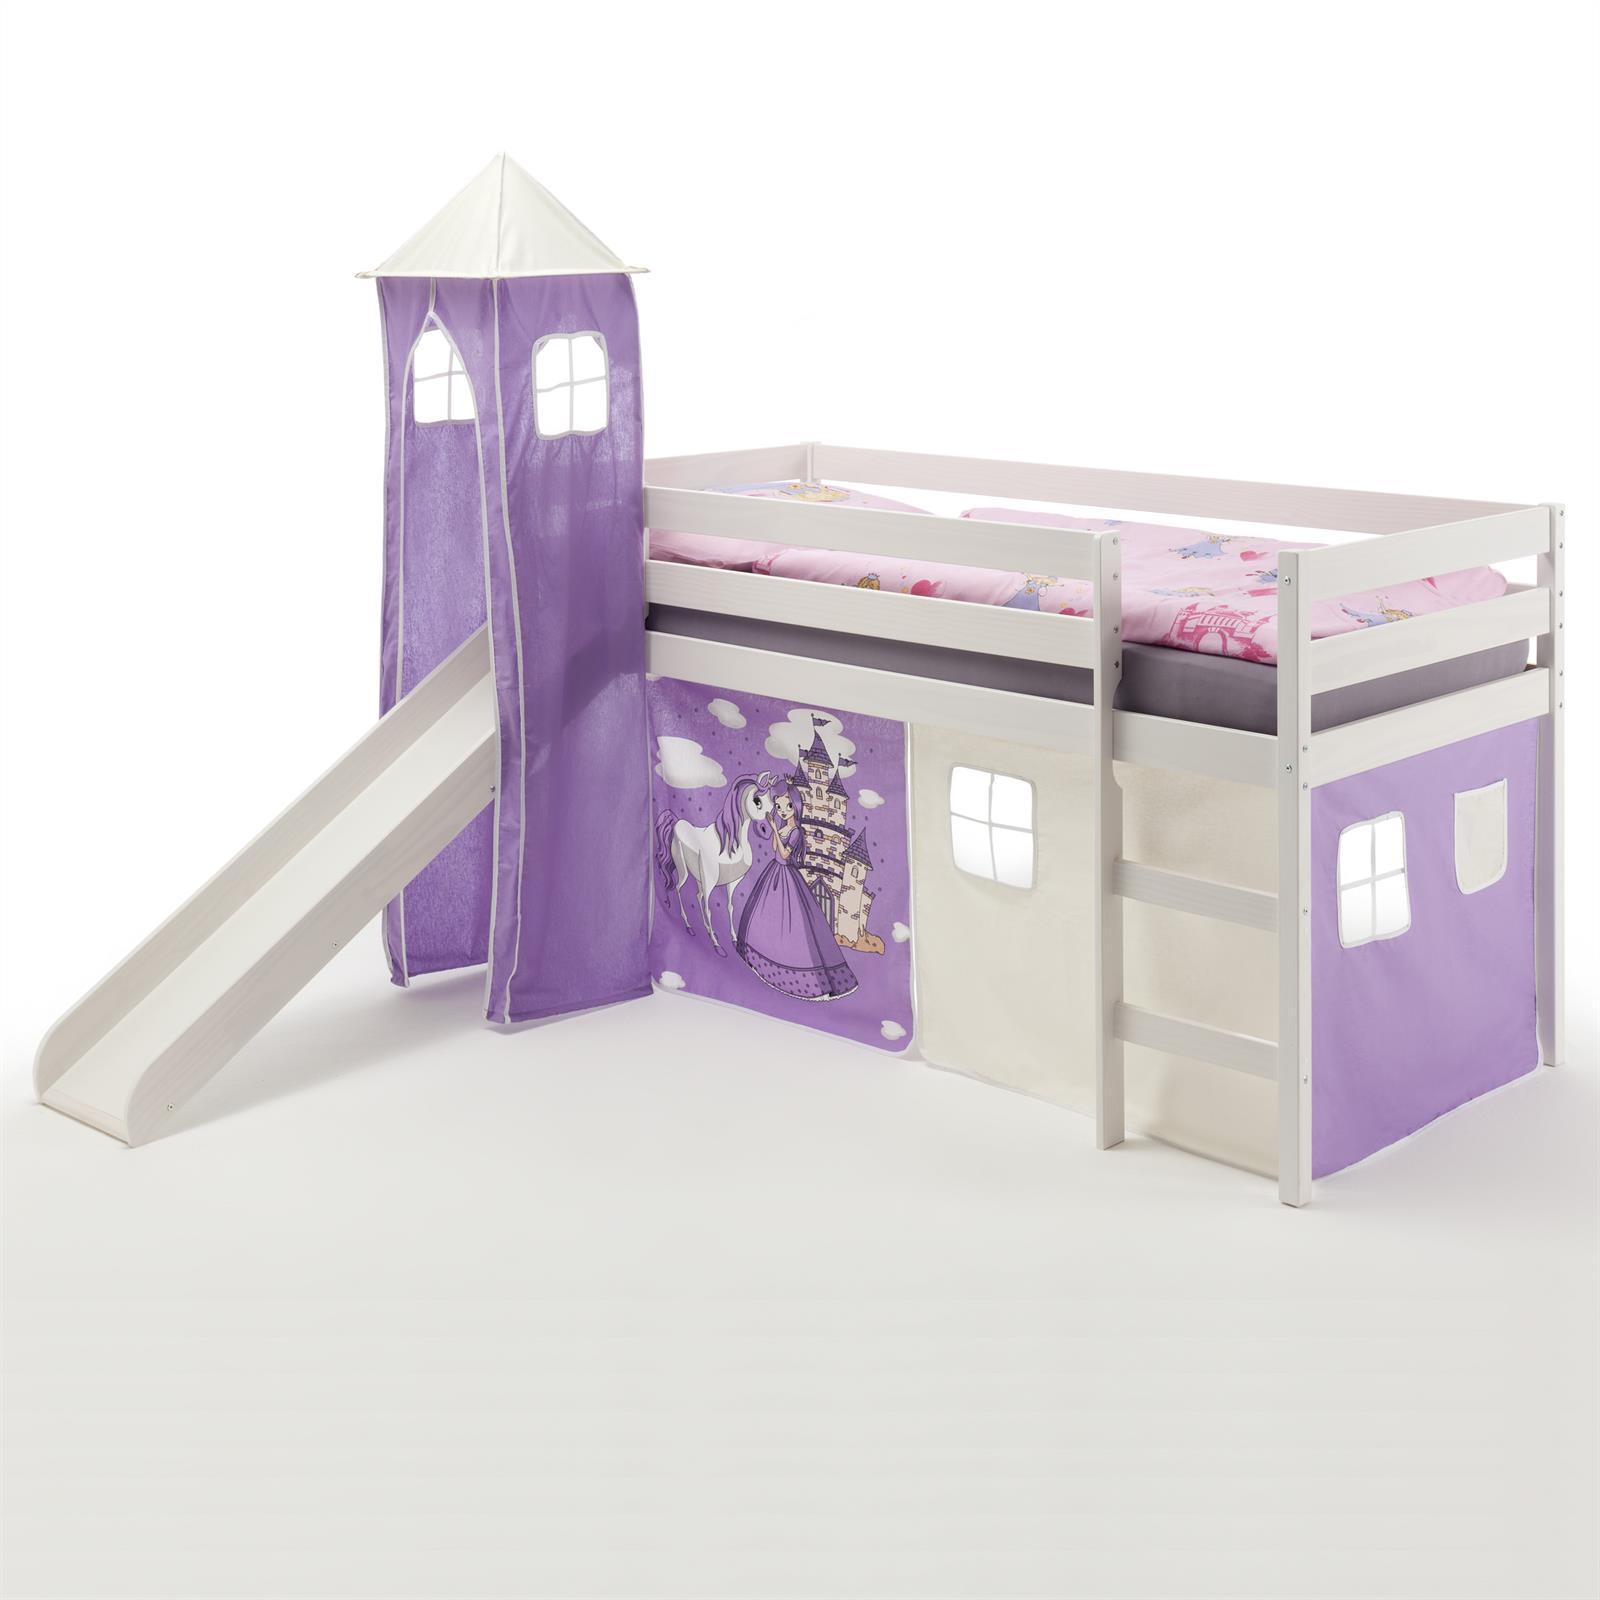 charming rideau lit mi hauteur 2 70160 max min. Black Bedroom Furniture Sets. Home Design Ideas